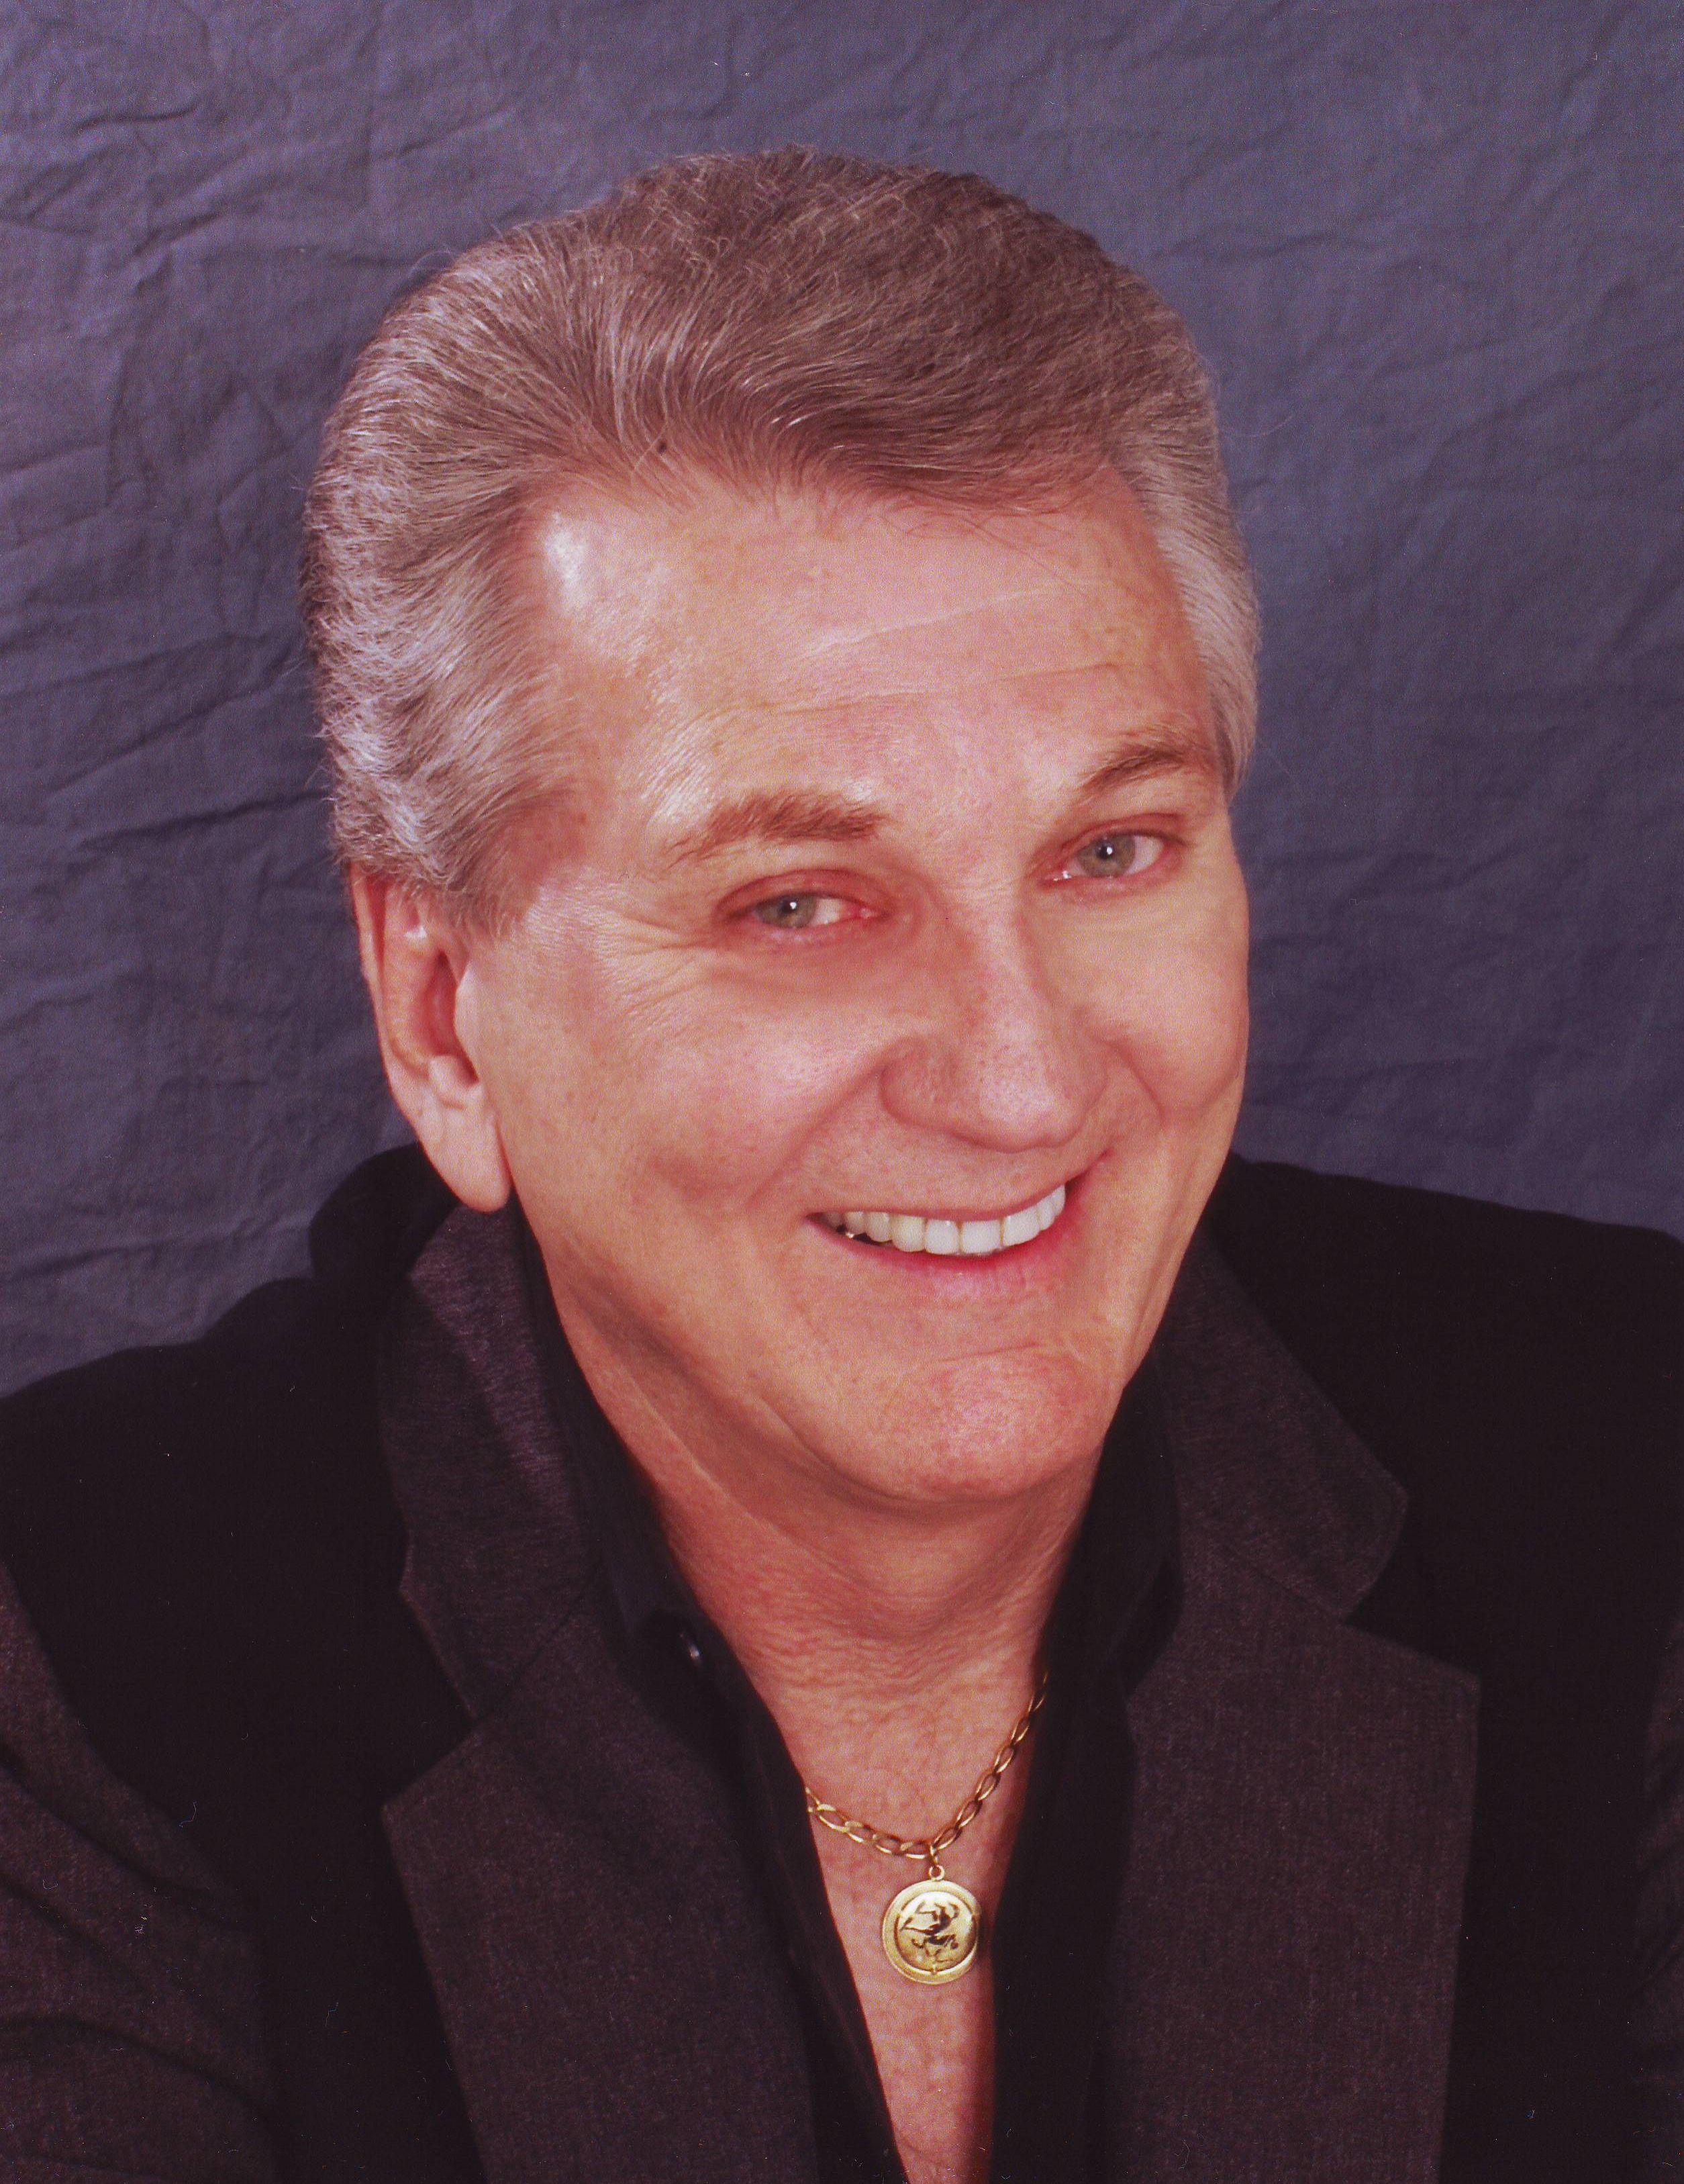 Ross Lewis